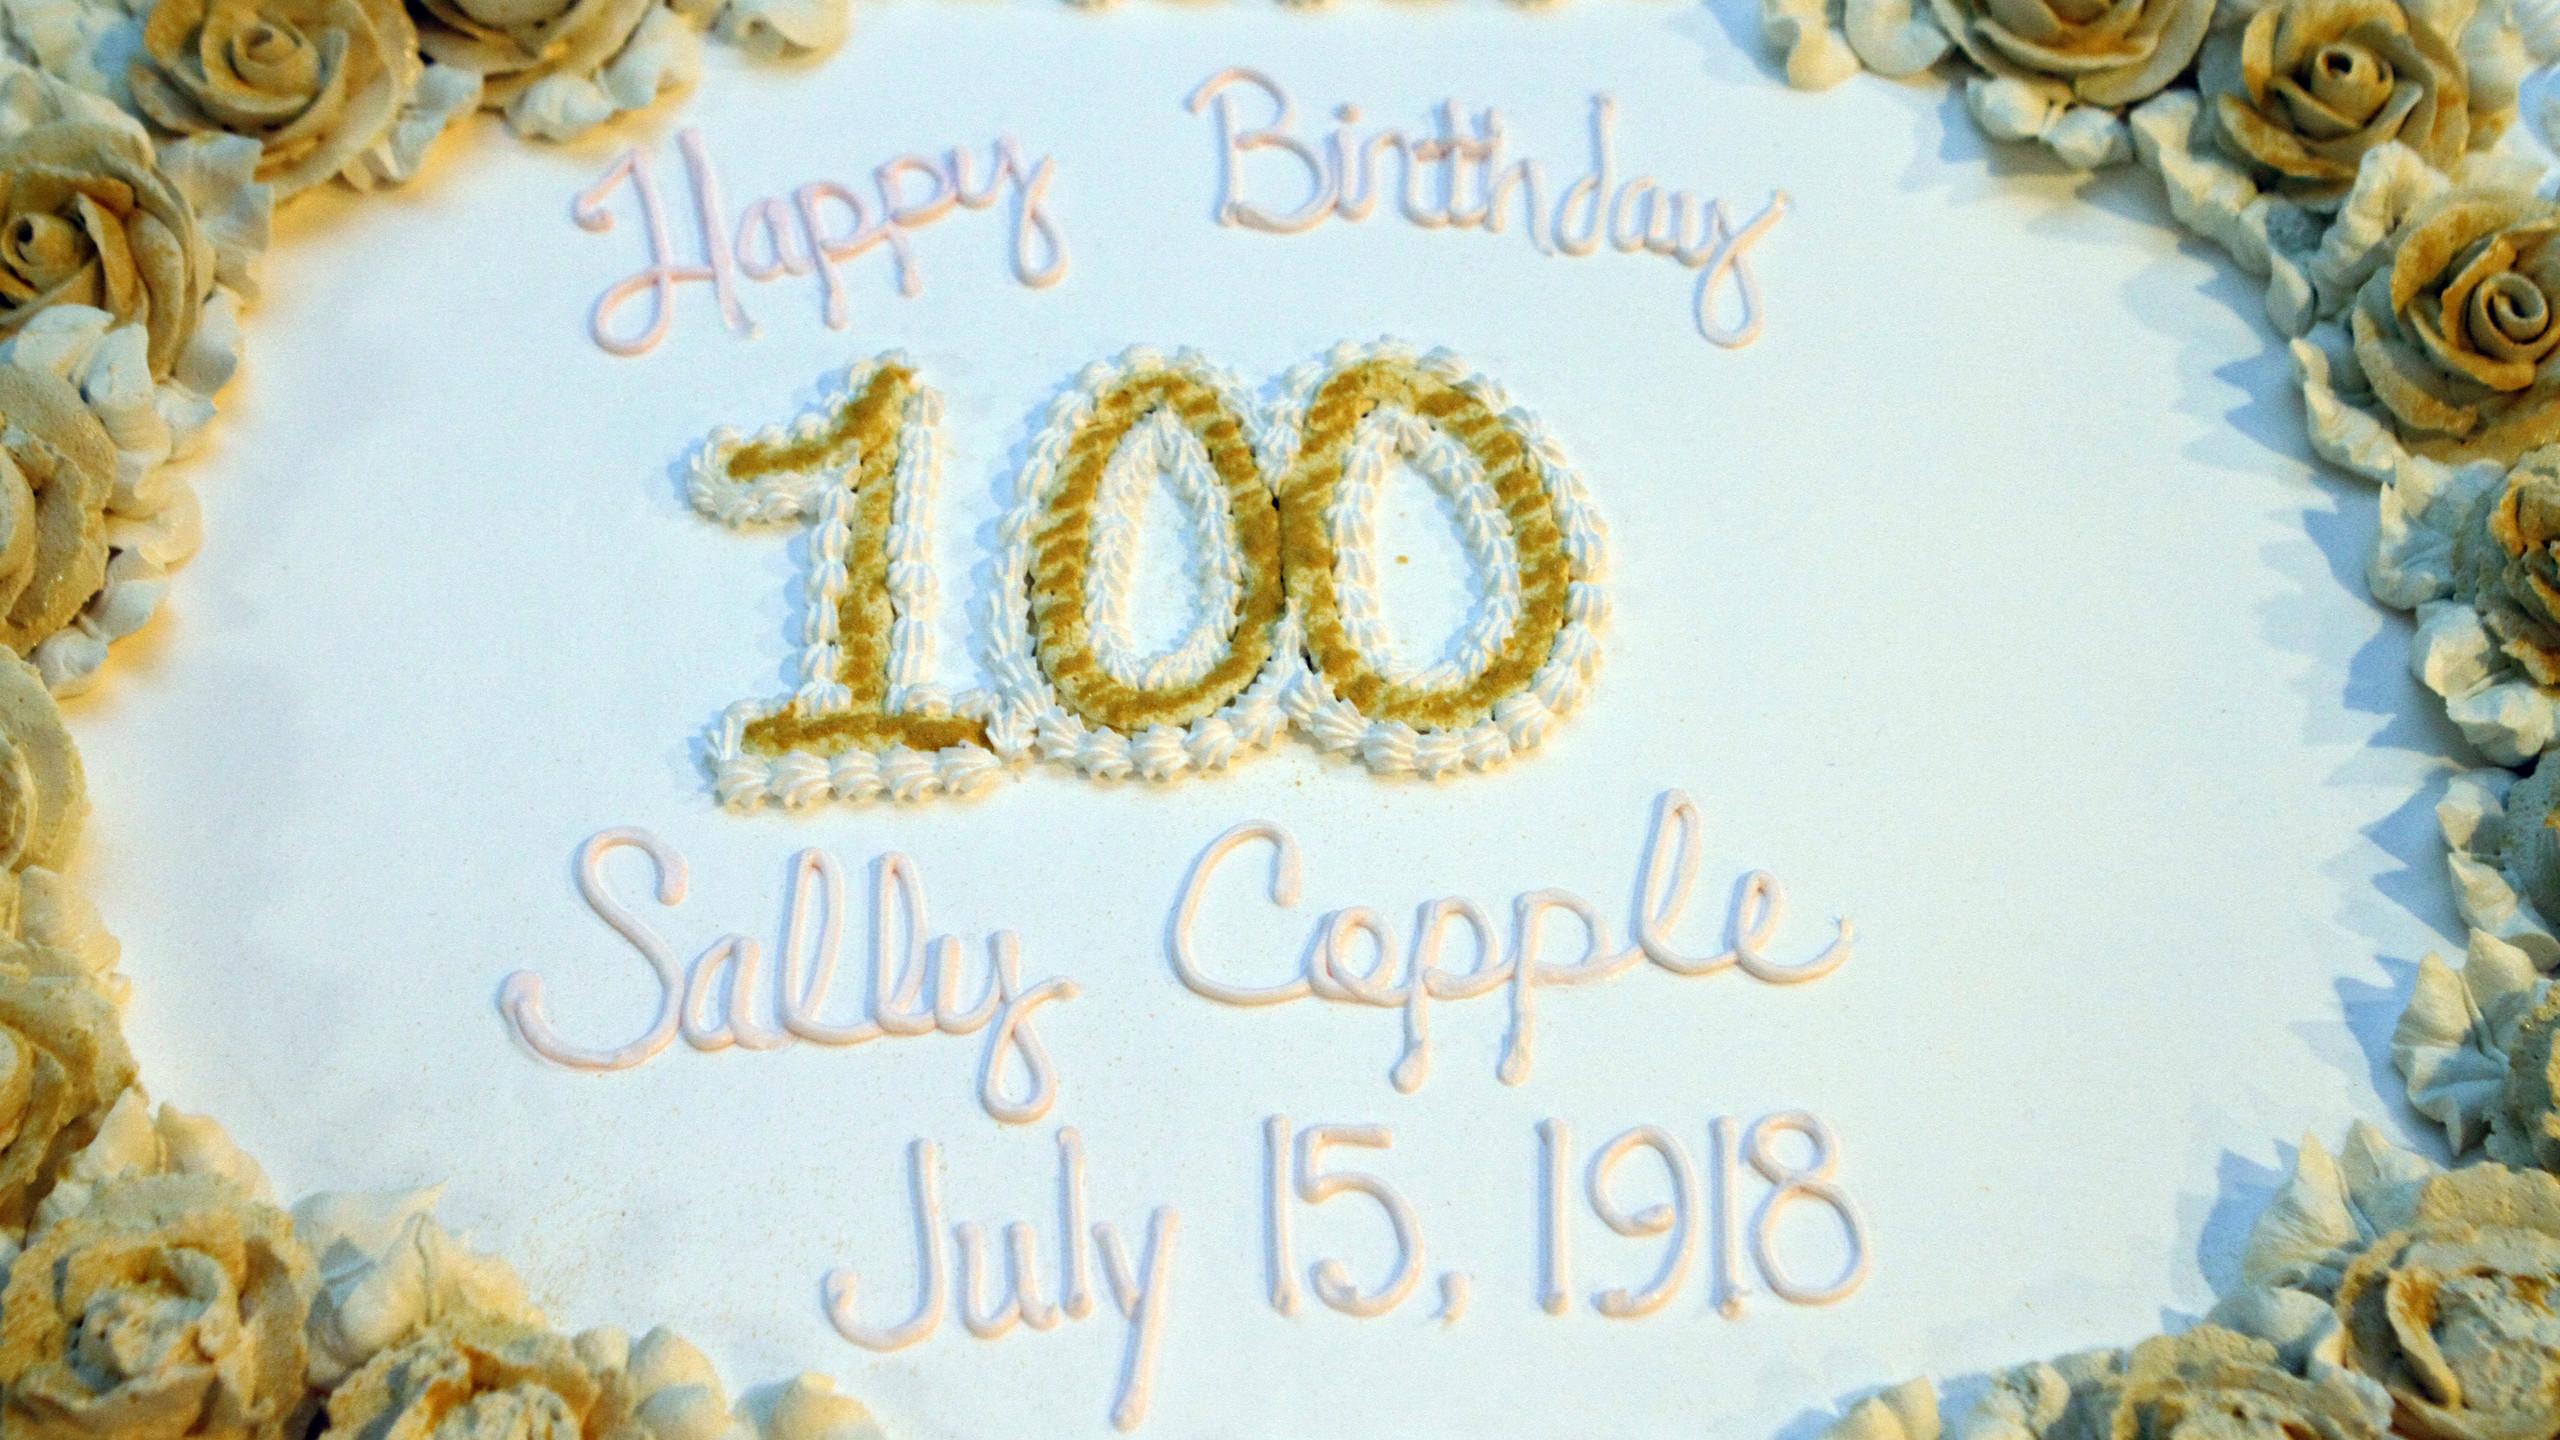 Sally Copple celebrates her 100th birthd